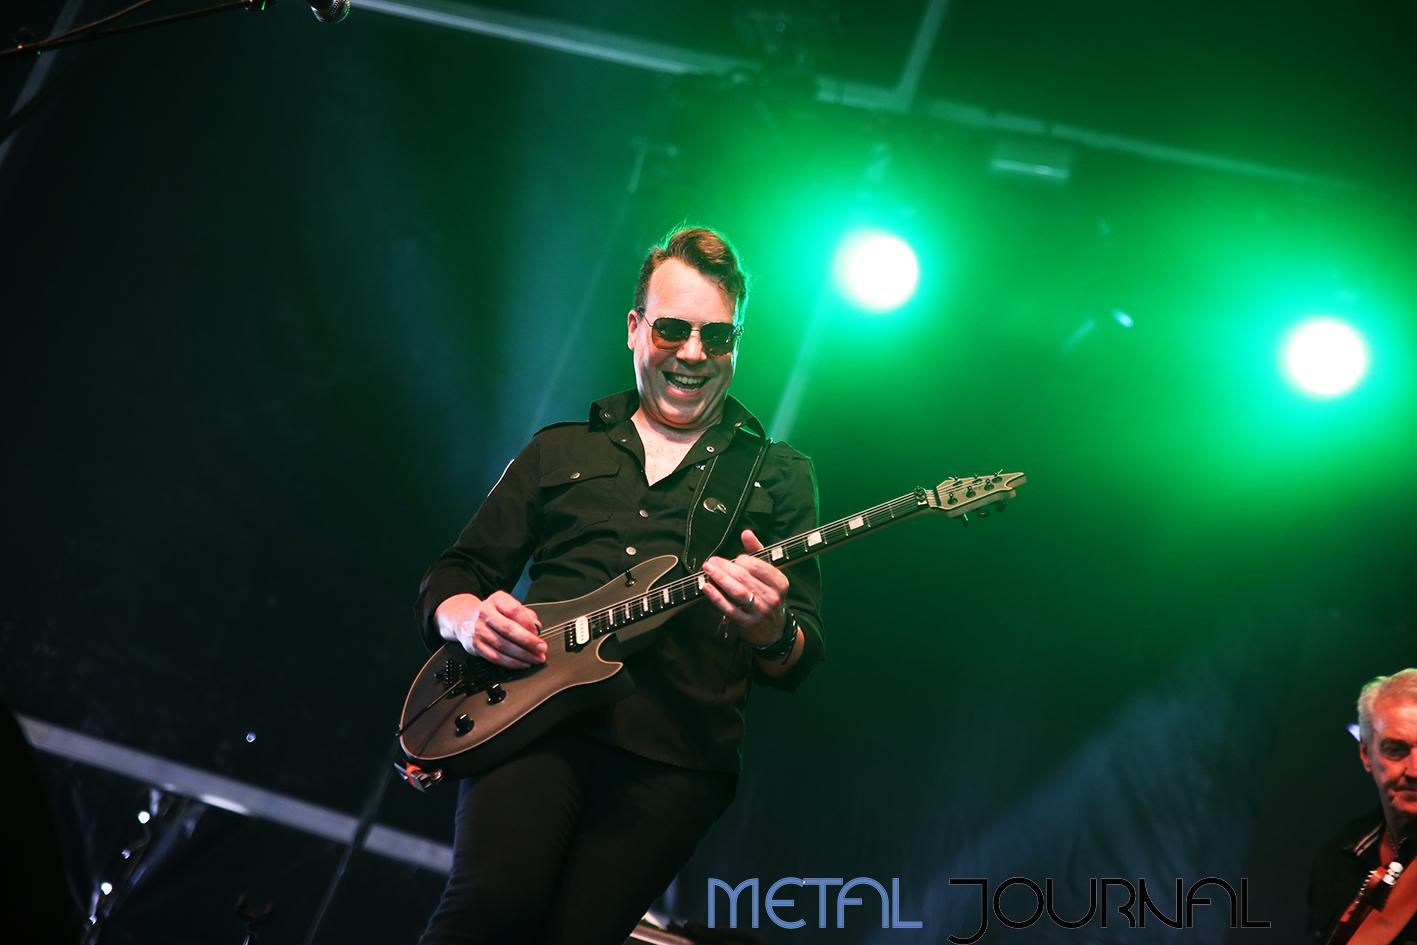 fm - metal journal rock fest barcelona 2019 pic 3